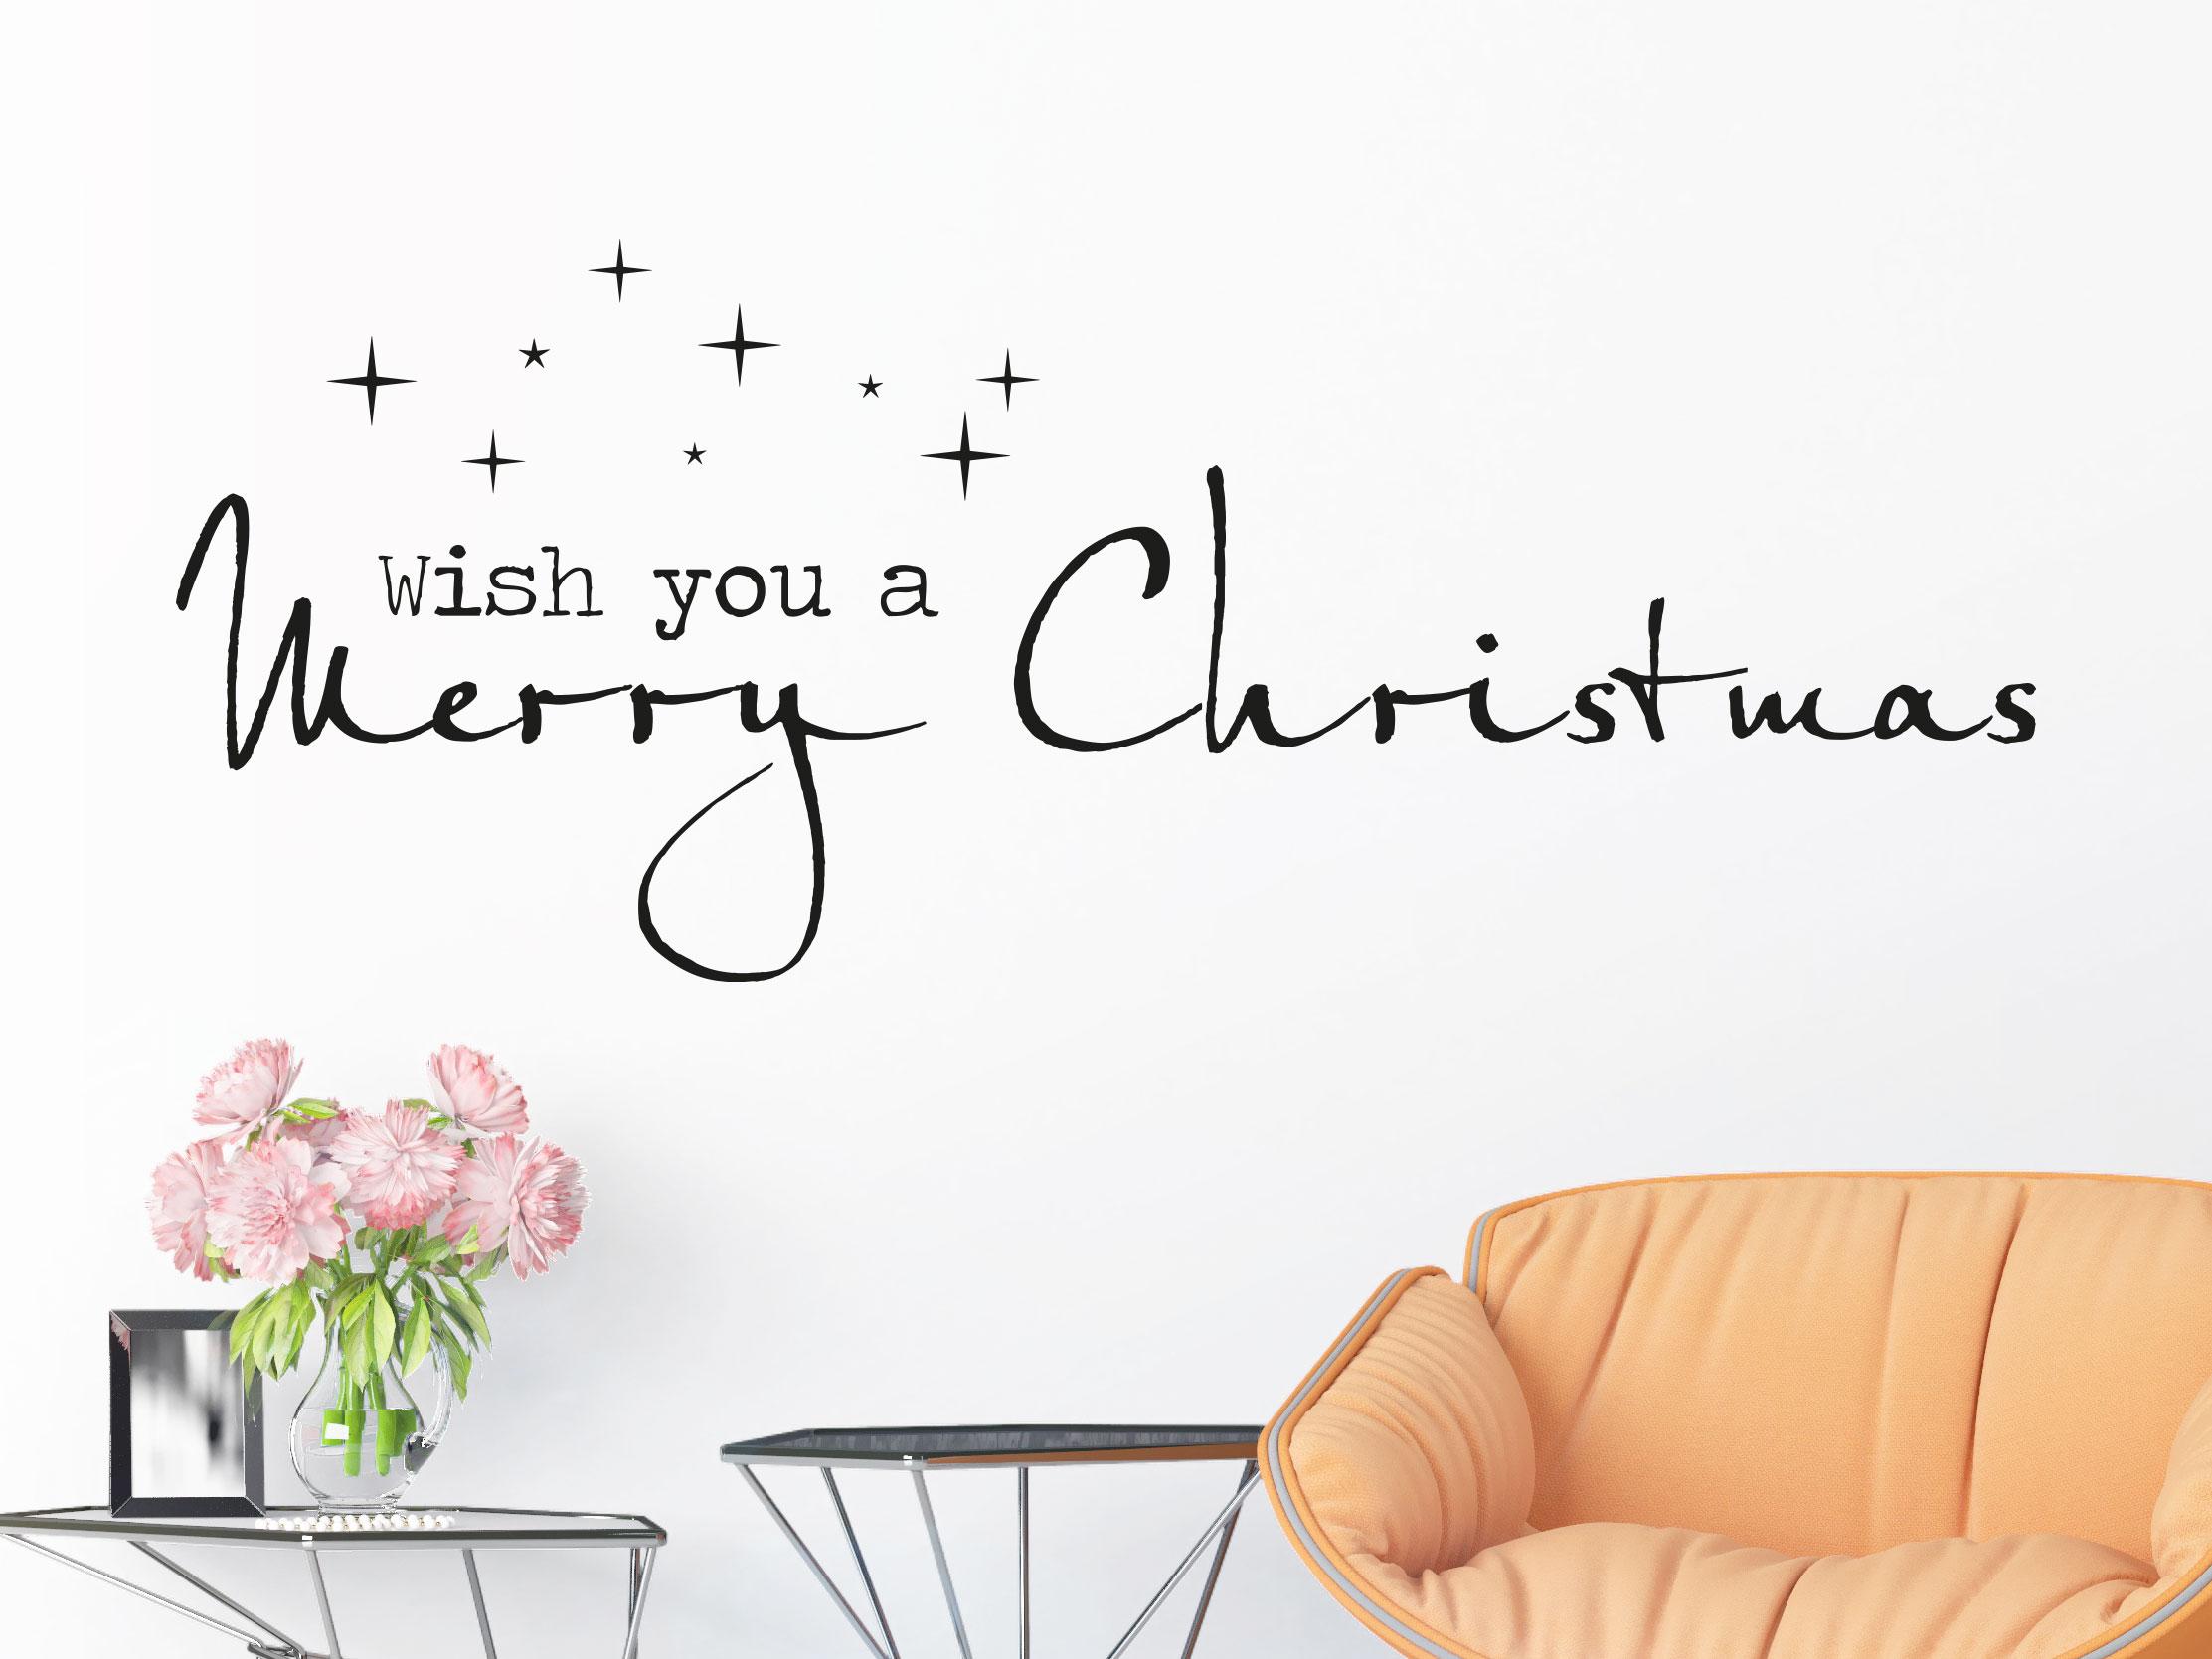 Wish you a merry Christmas Wandtattoo in schwarz